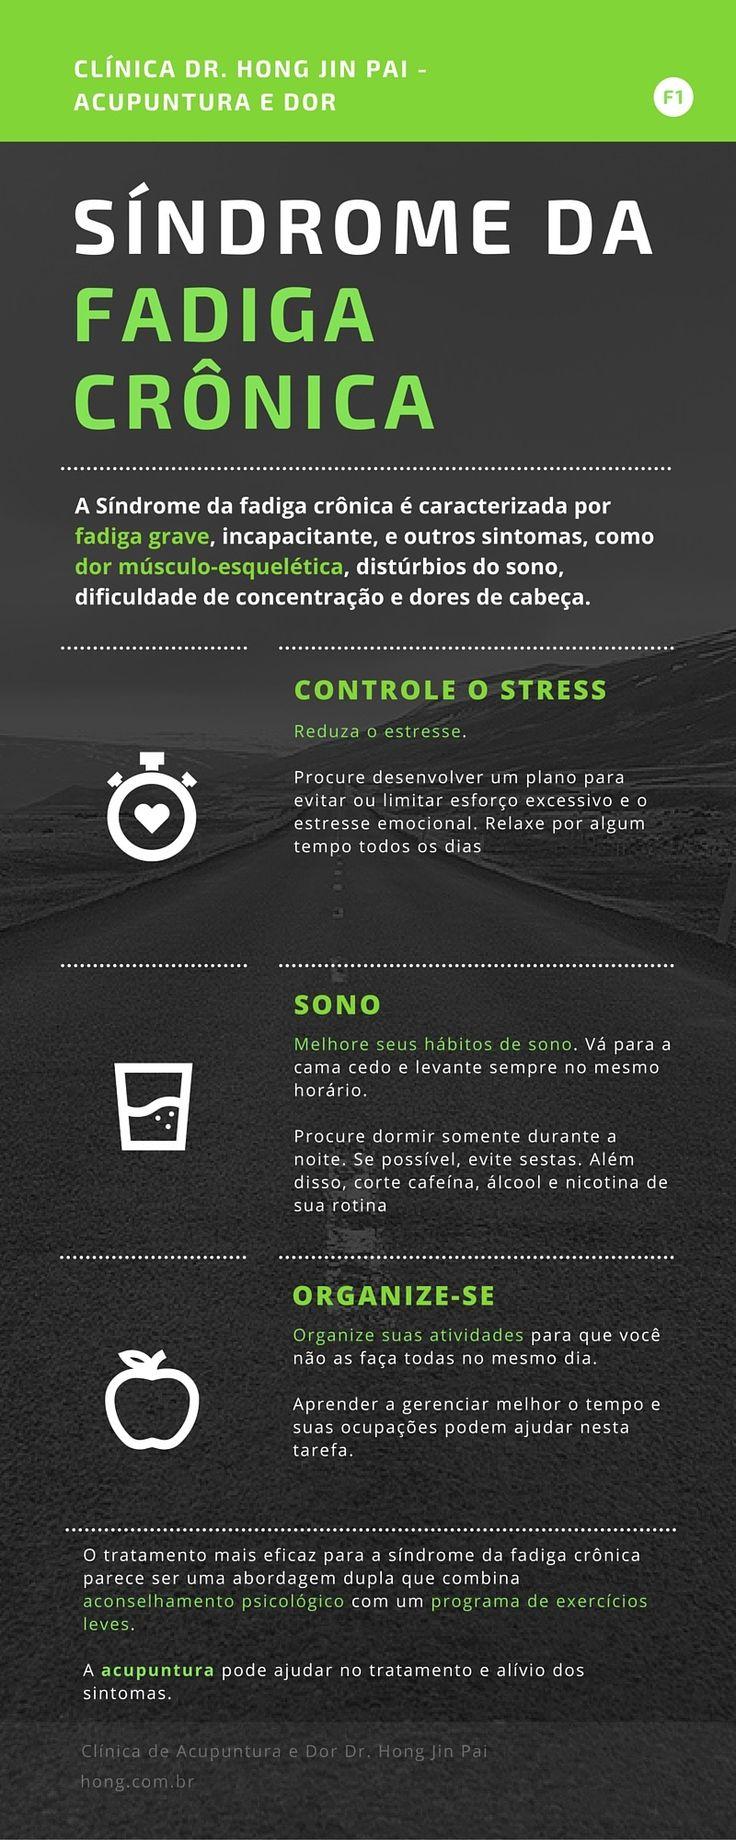 Infografico Acupuntura e Sindrome da Fadiga Cronica. Por Dr. Marcus Yu Bin Pai